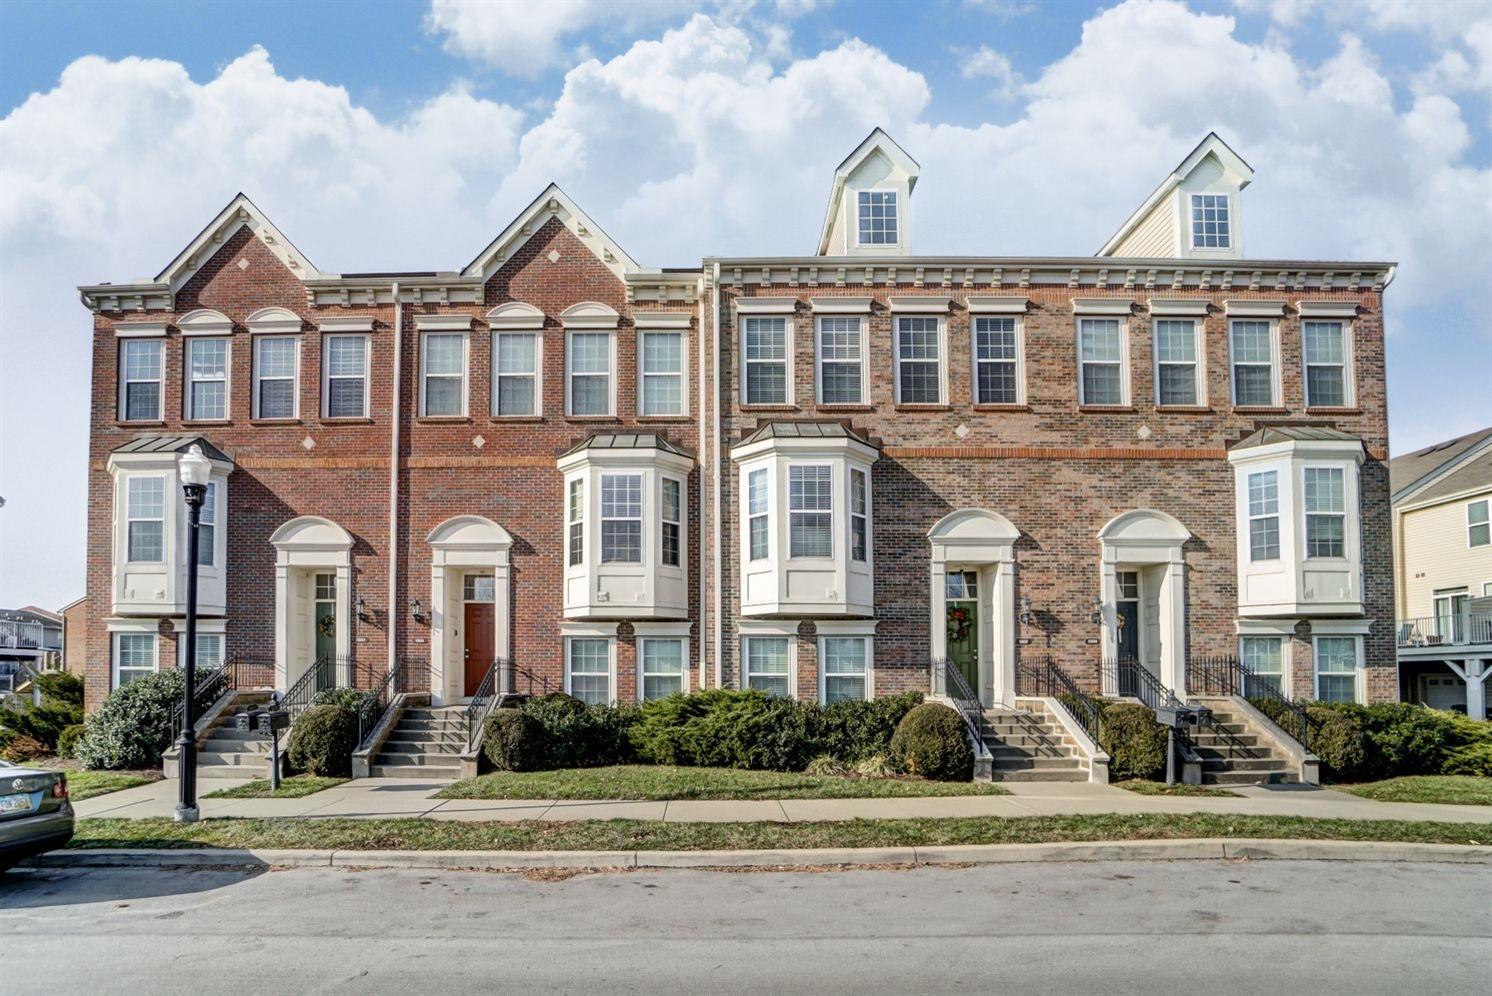 Property for sale at 1303 Cutter Street, Cincinnati,  OH 45203